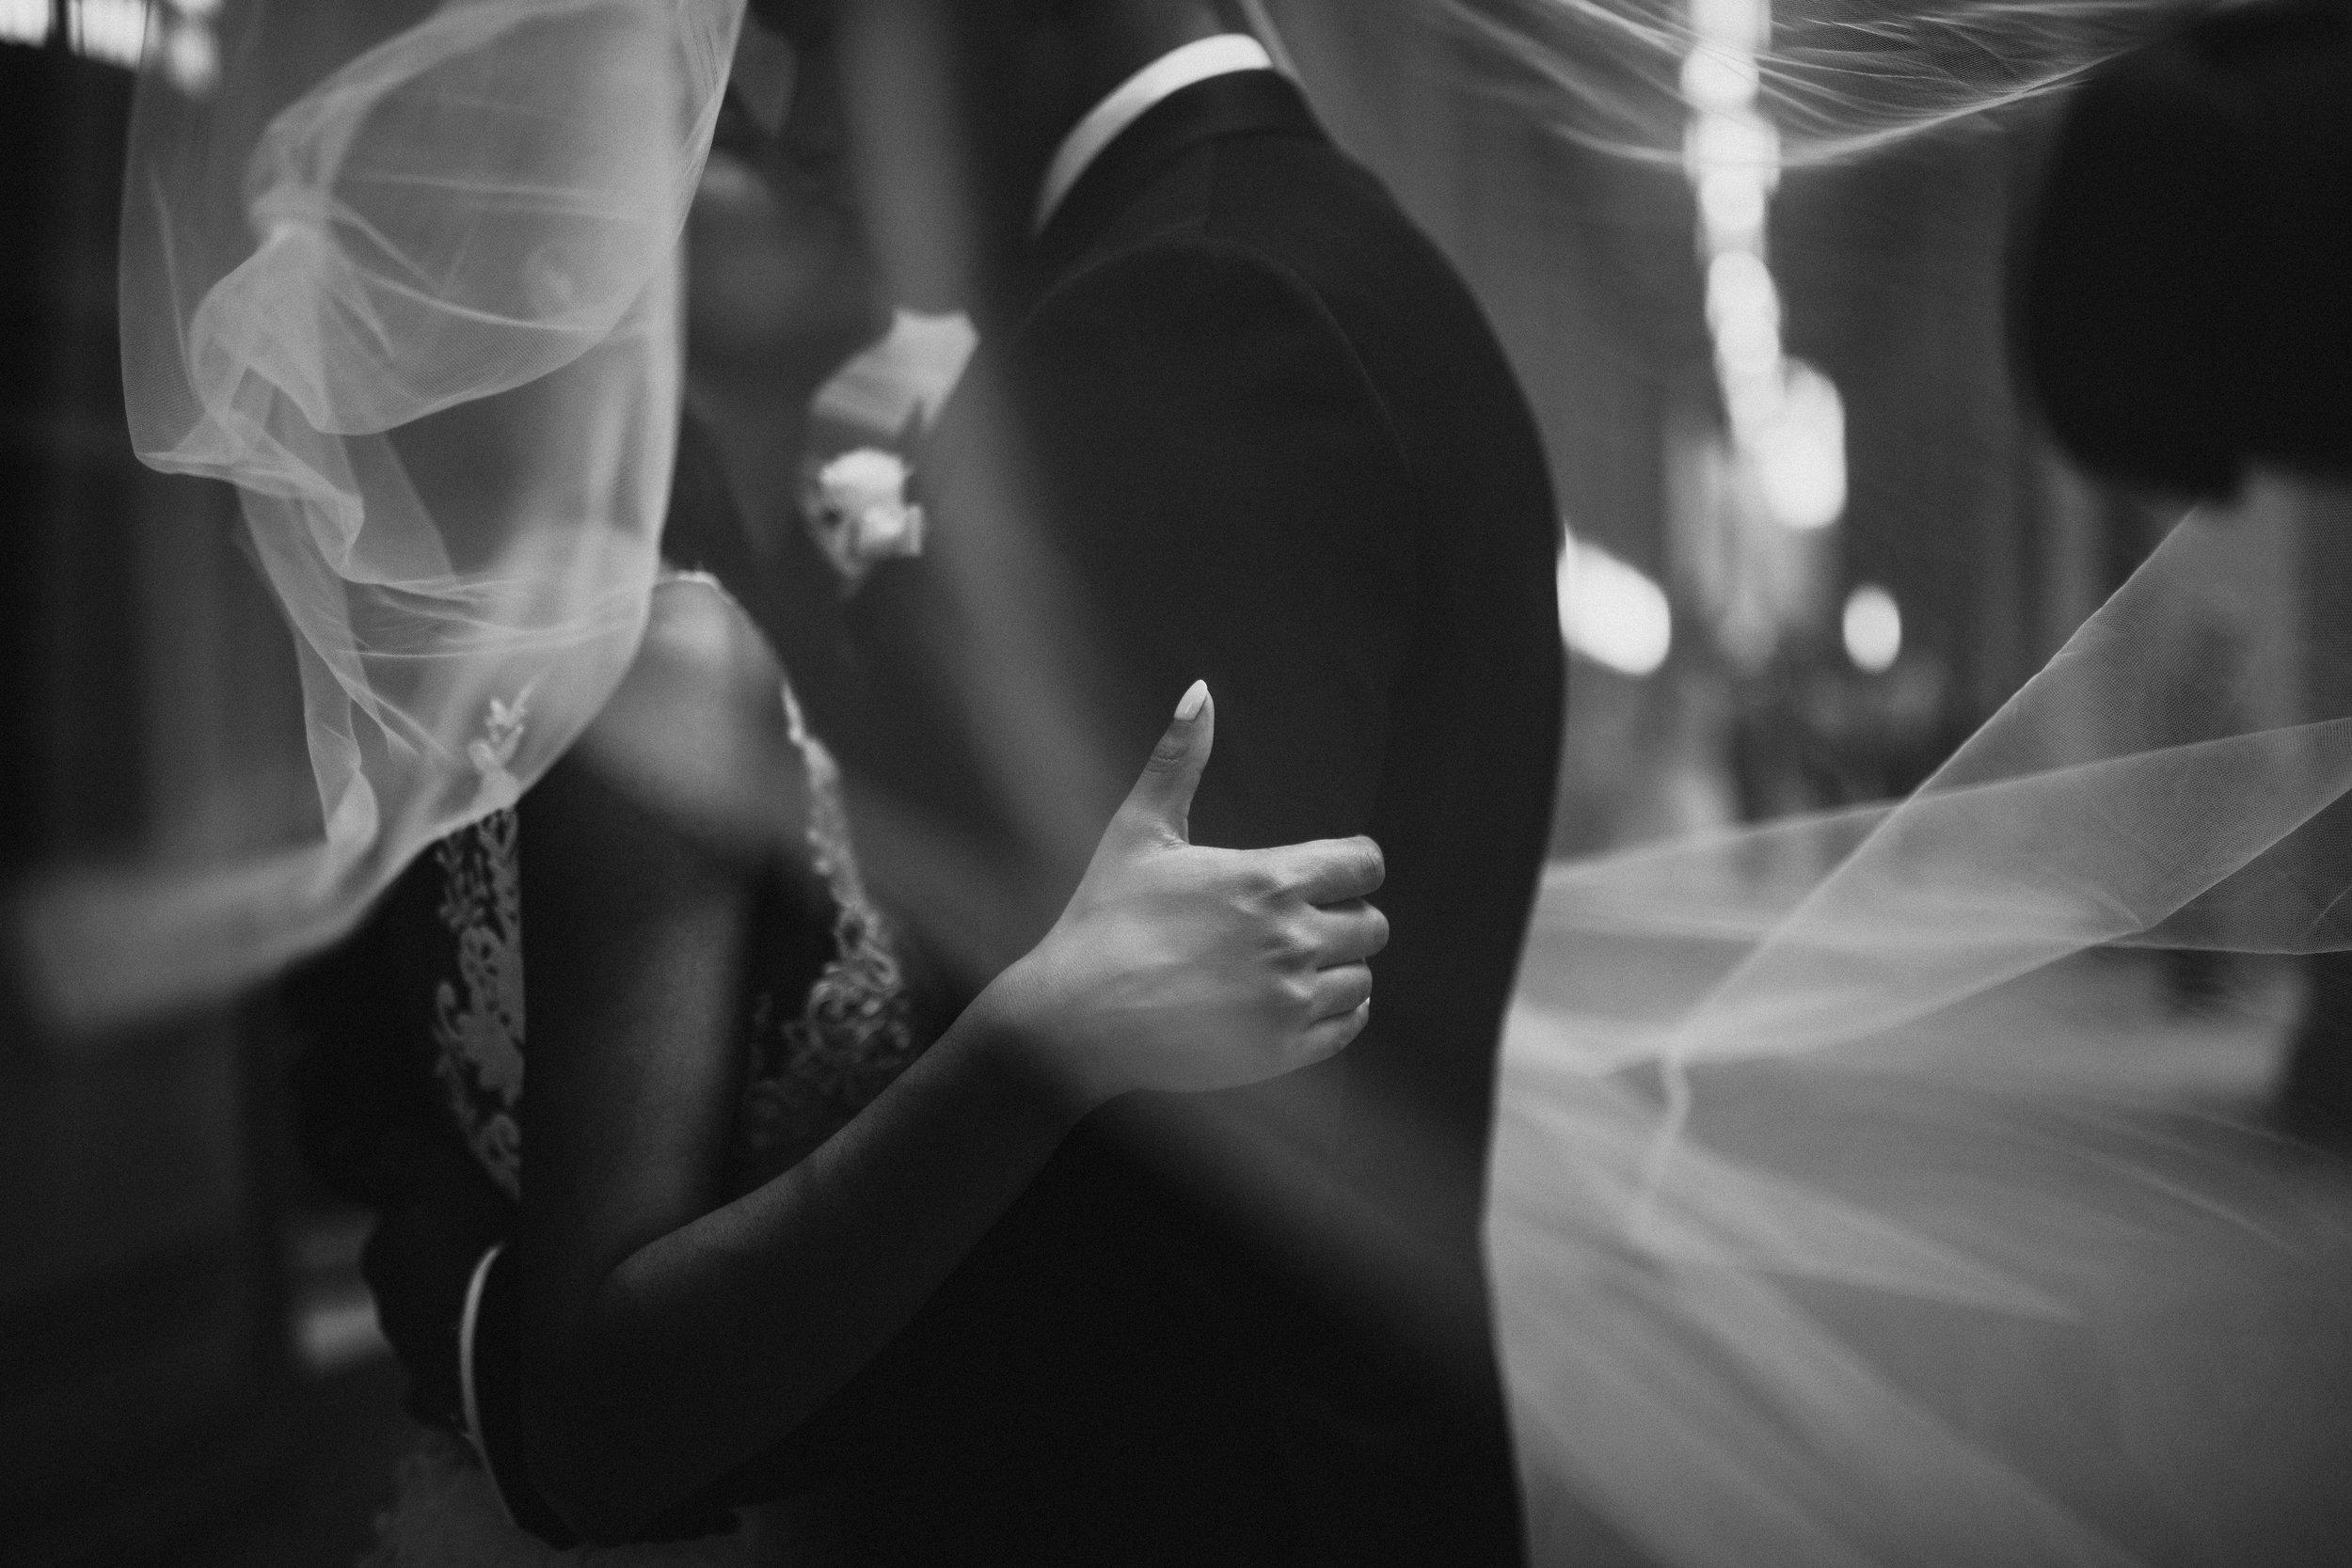 Mindy&Jared-wedding-by-LadiesAndGentlemen-by-Matija-Vuri-4333.jpg